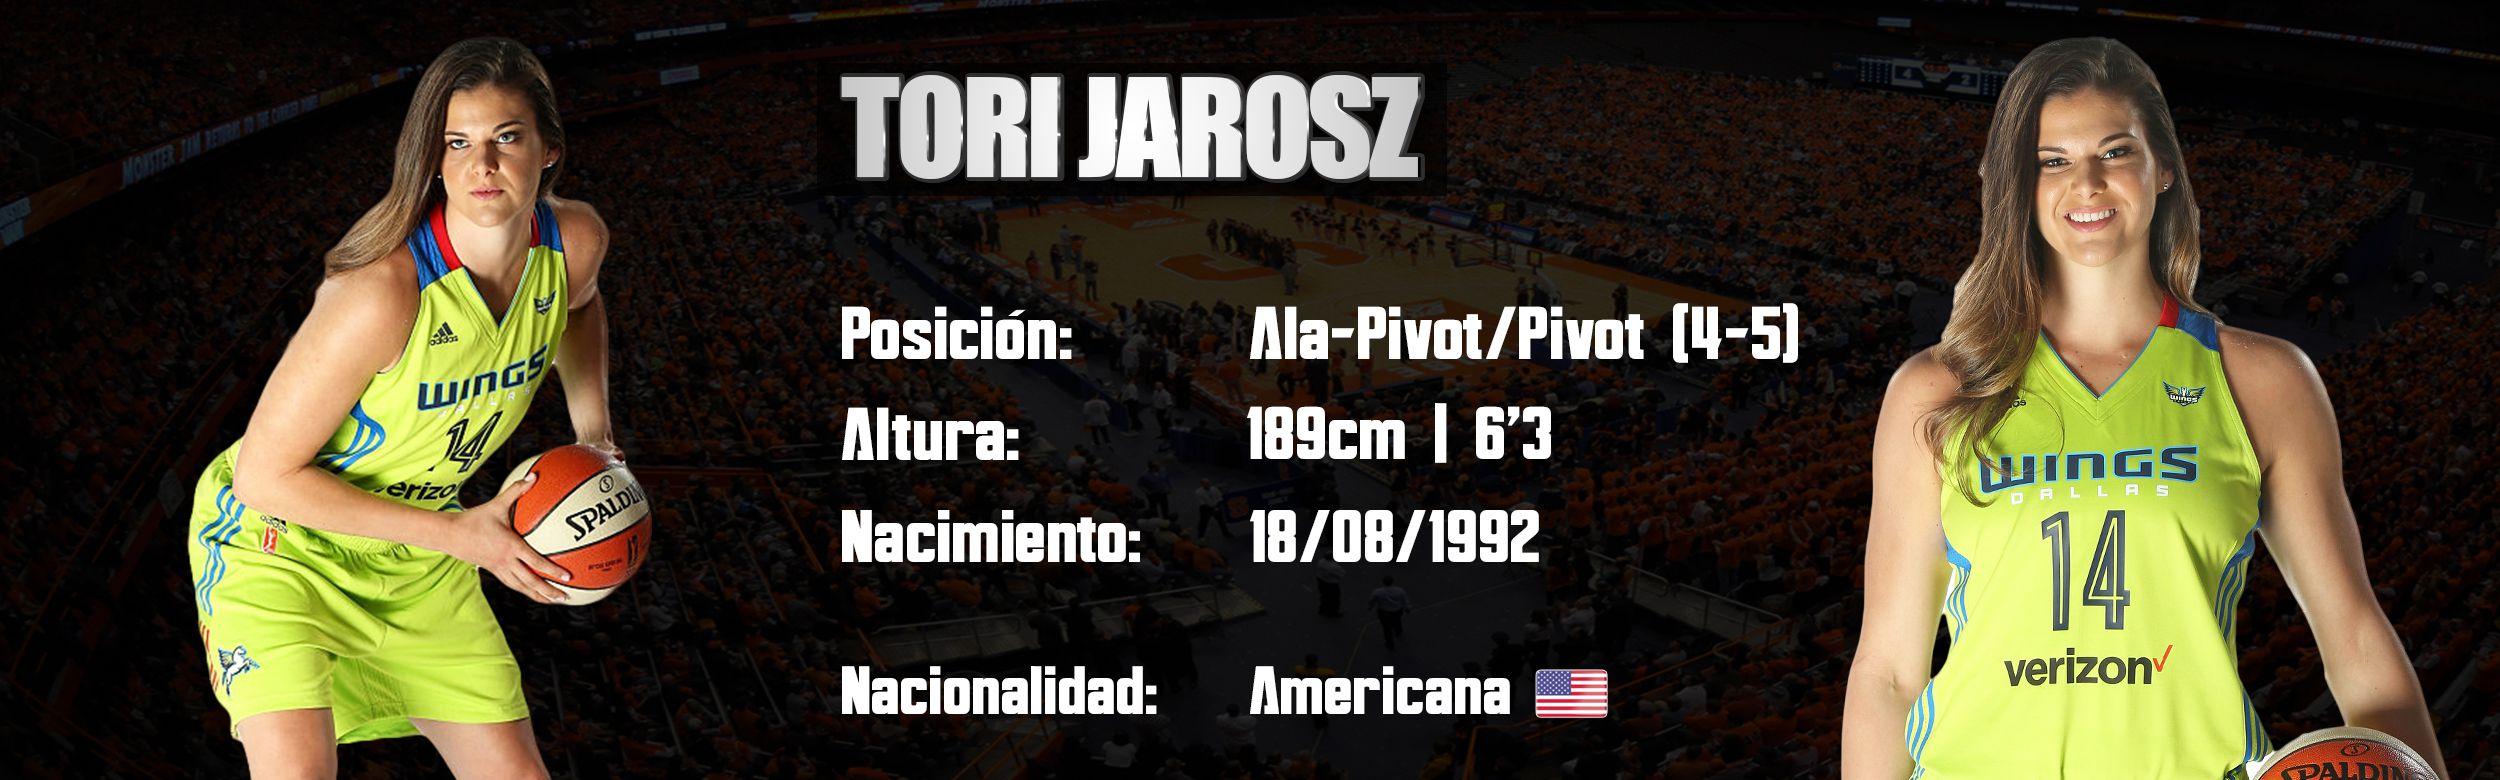 Tori Jarosz